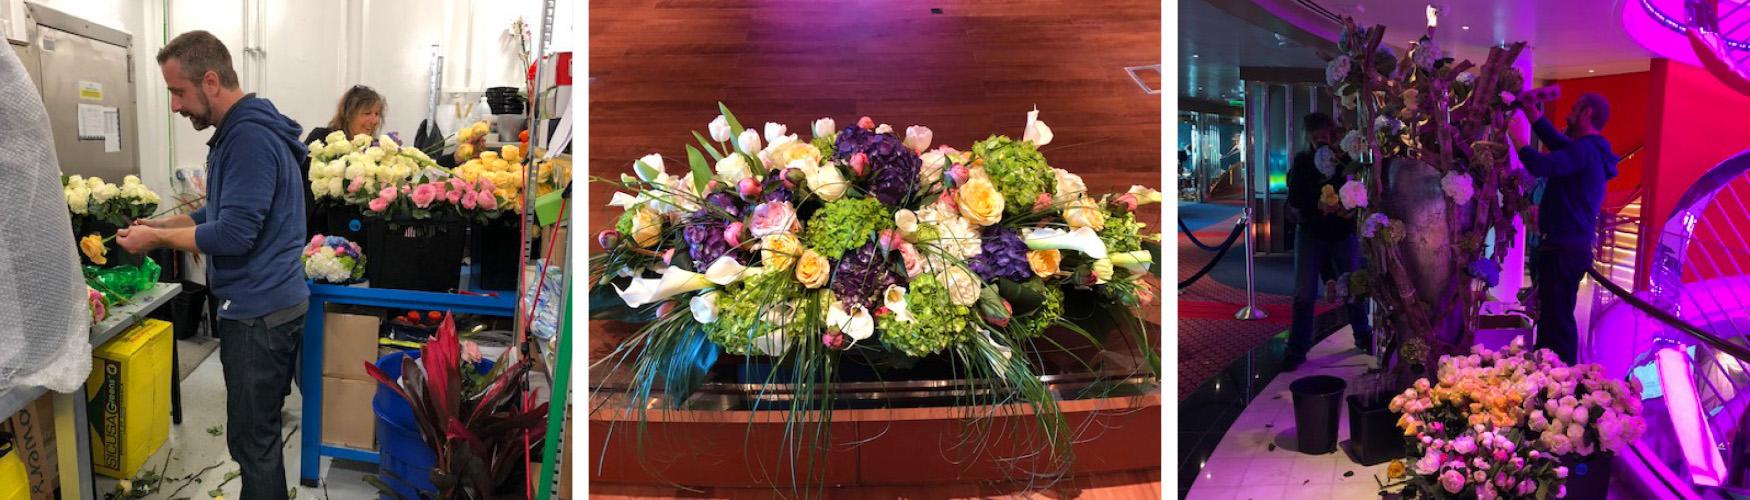 Cruise-Ship-Flowers-Oprah-Holland-America-5.jpg